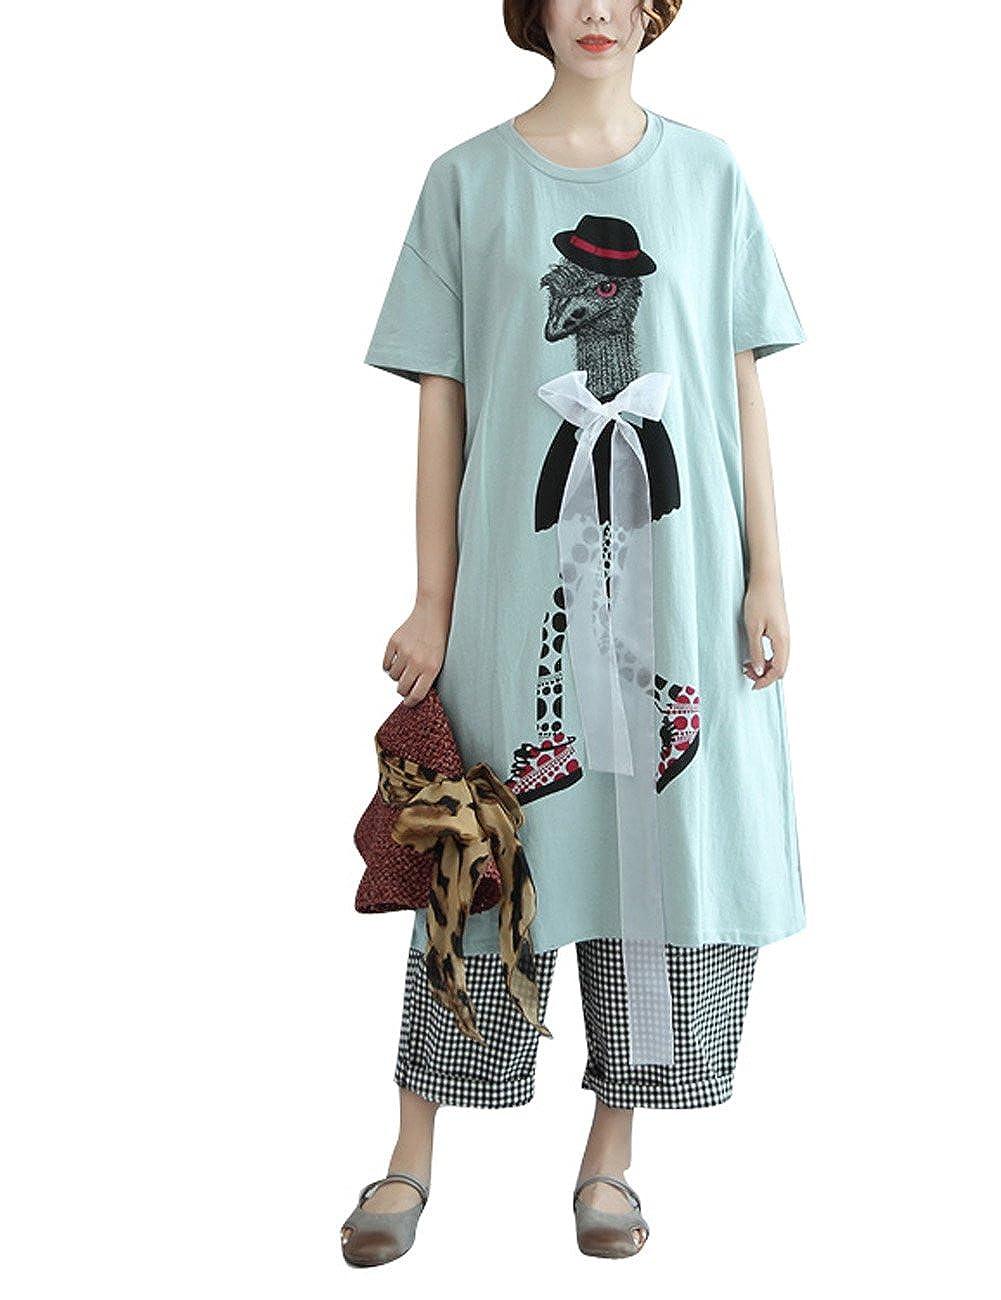 Yesno QP8 Women Girl Funny Loose Graphic Tee T-Shirt Dress 100% Cotton Cartoon Lace Ribbon/Pocket at Amazon Womens Clothing store: